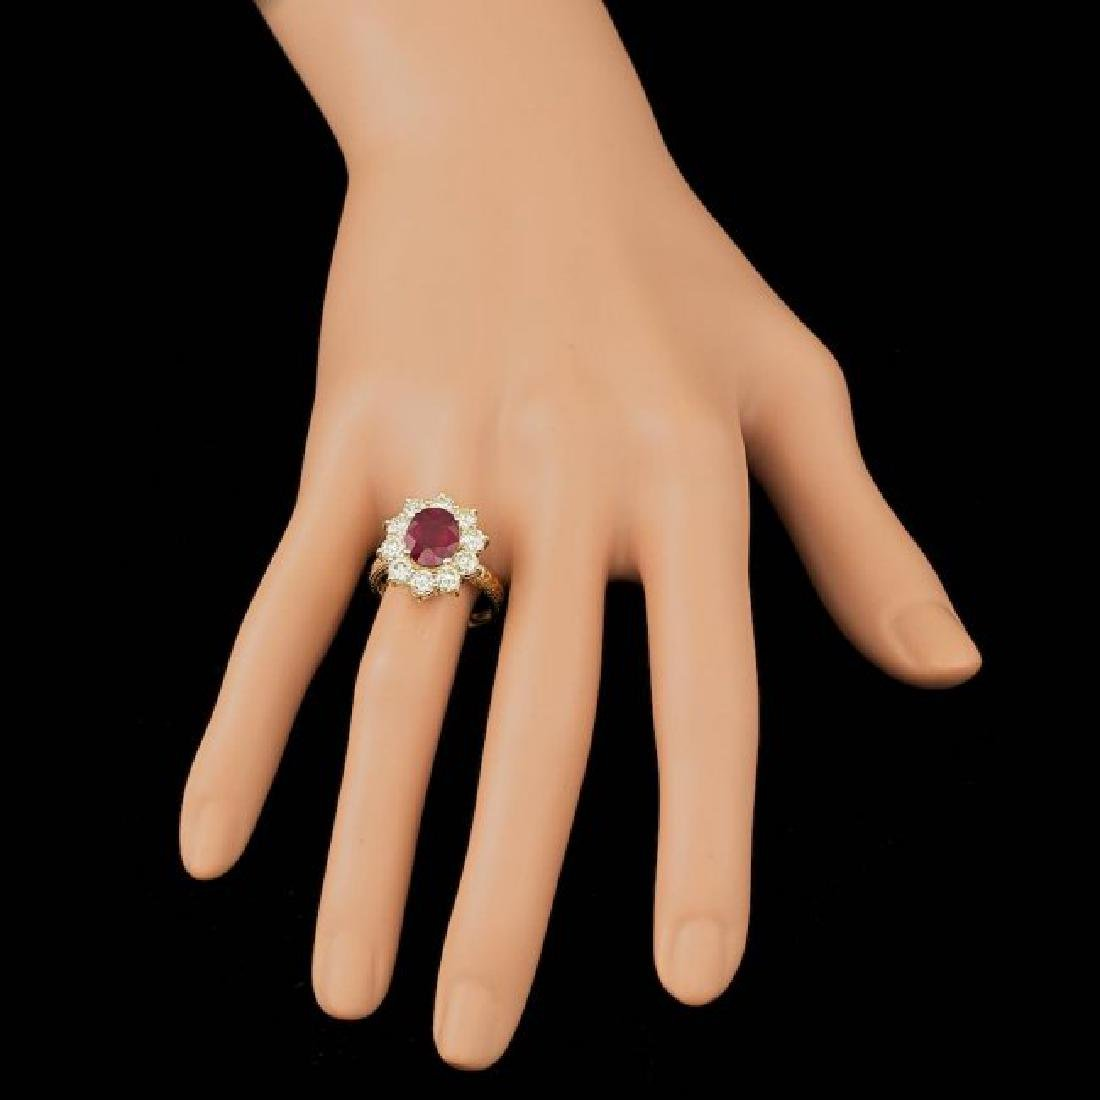 14k Yellow Gold 3.00ct Ruby 2.10ct Diamond Ring - 4